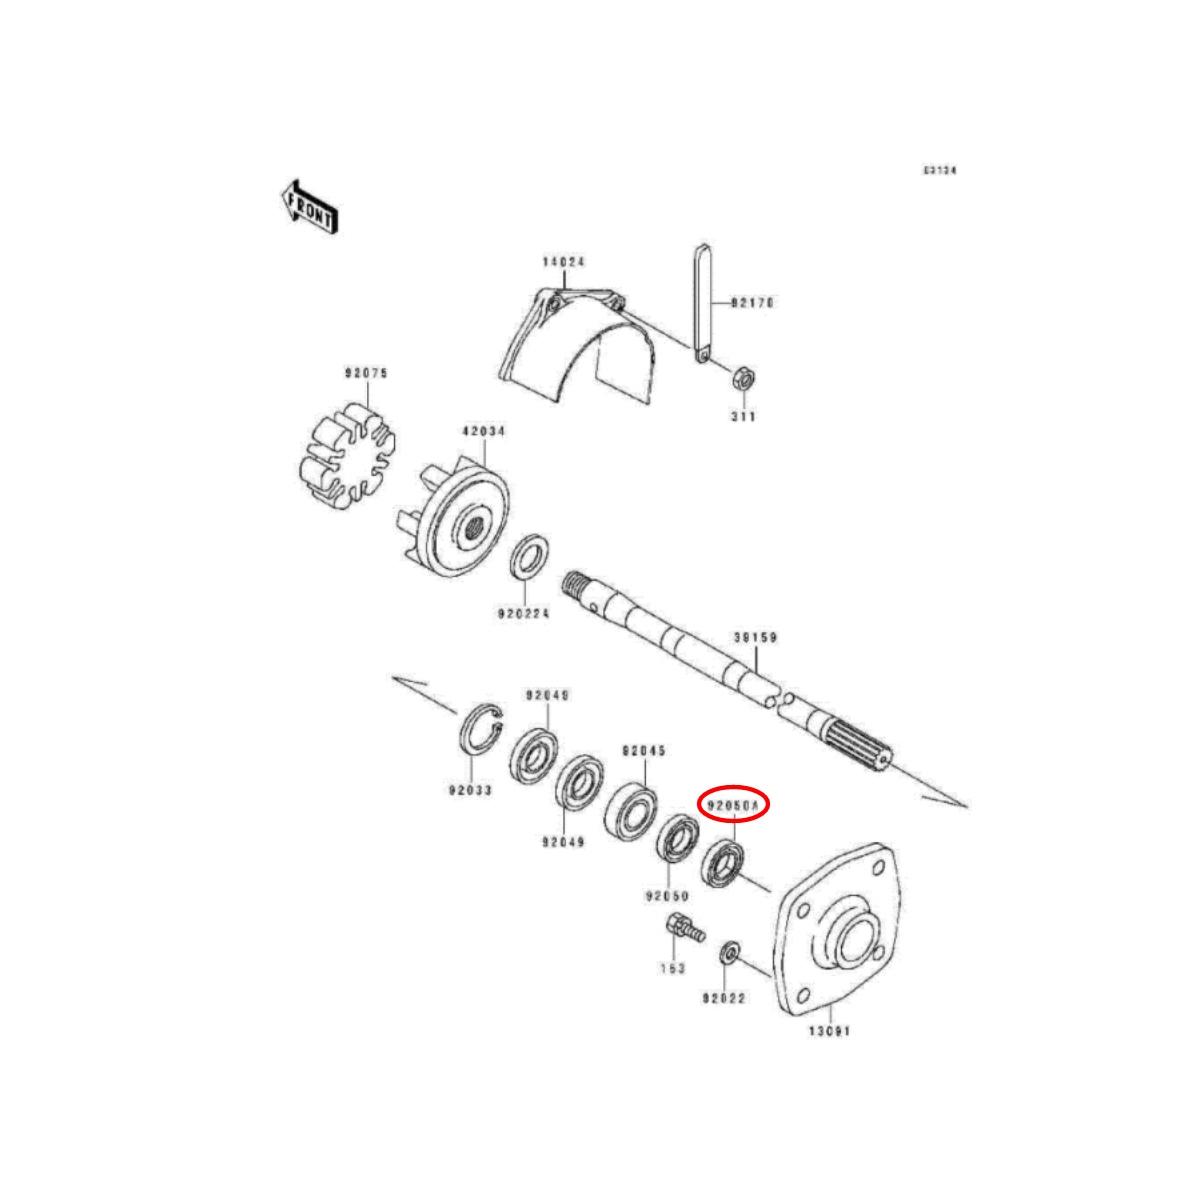 Retentor Casa Rolamento Jet Ski Kawasaki 36X19(X7  - Radical Peças - Peças para Jet Ski